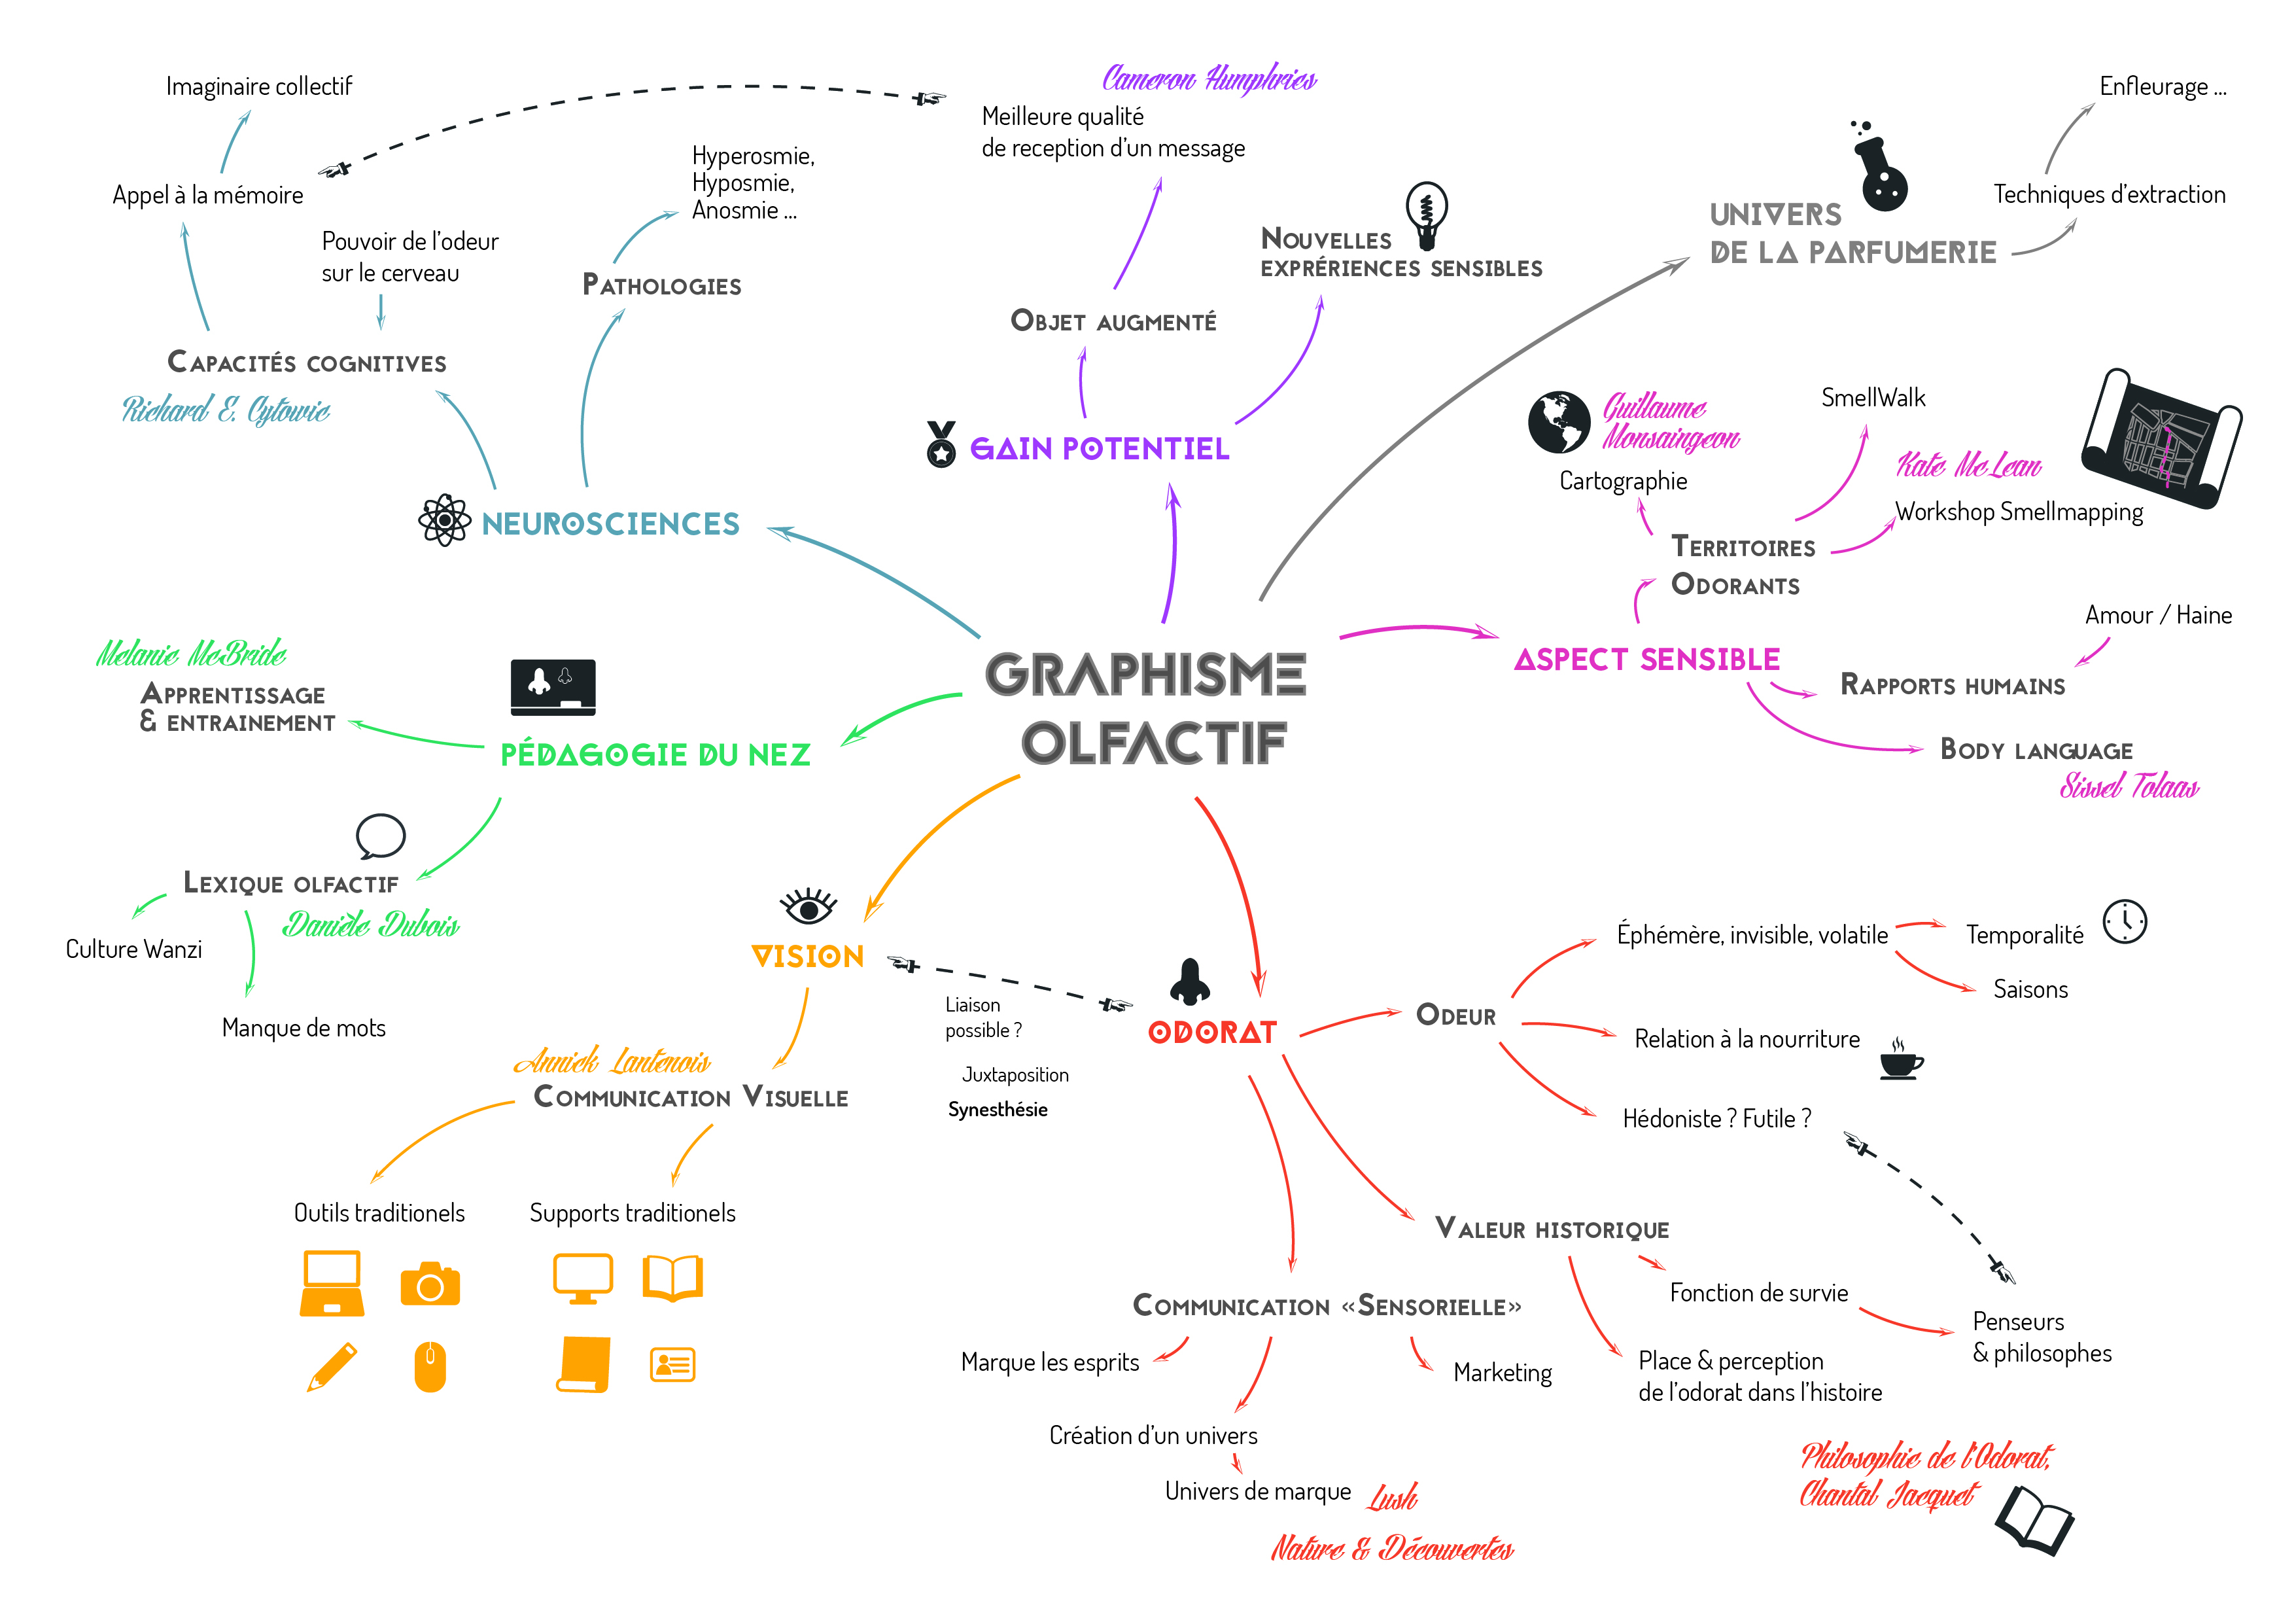 Wiki:memoires:olfactif:olfactif [Toner Kebab Wiki] intérieur Sens Olfactif